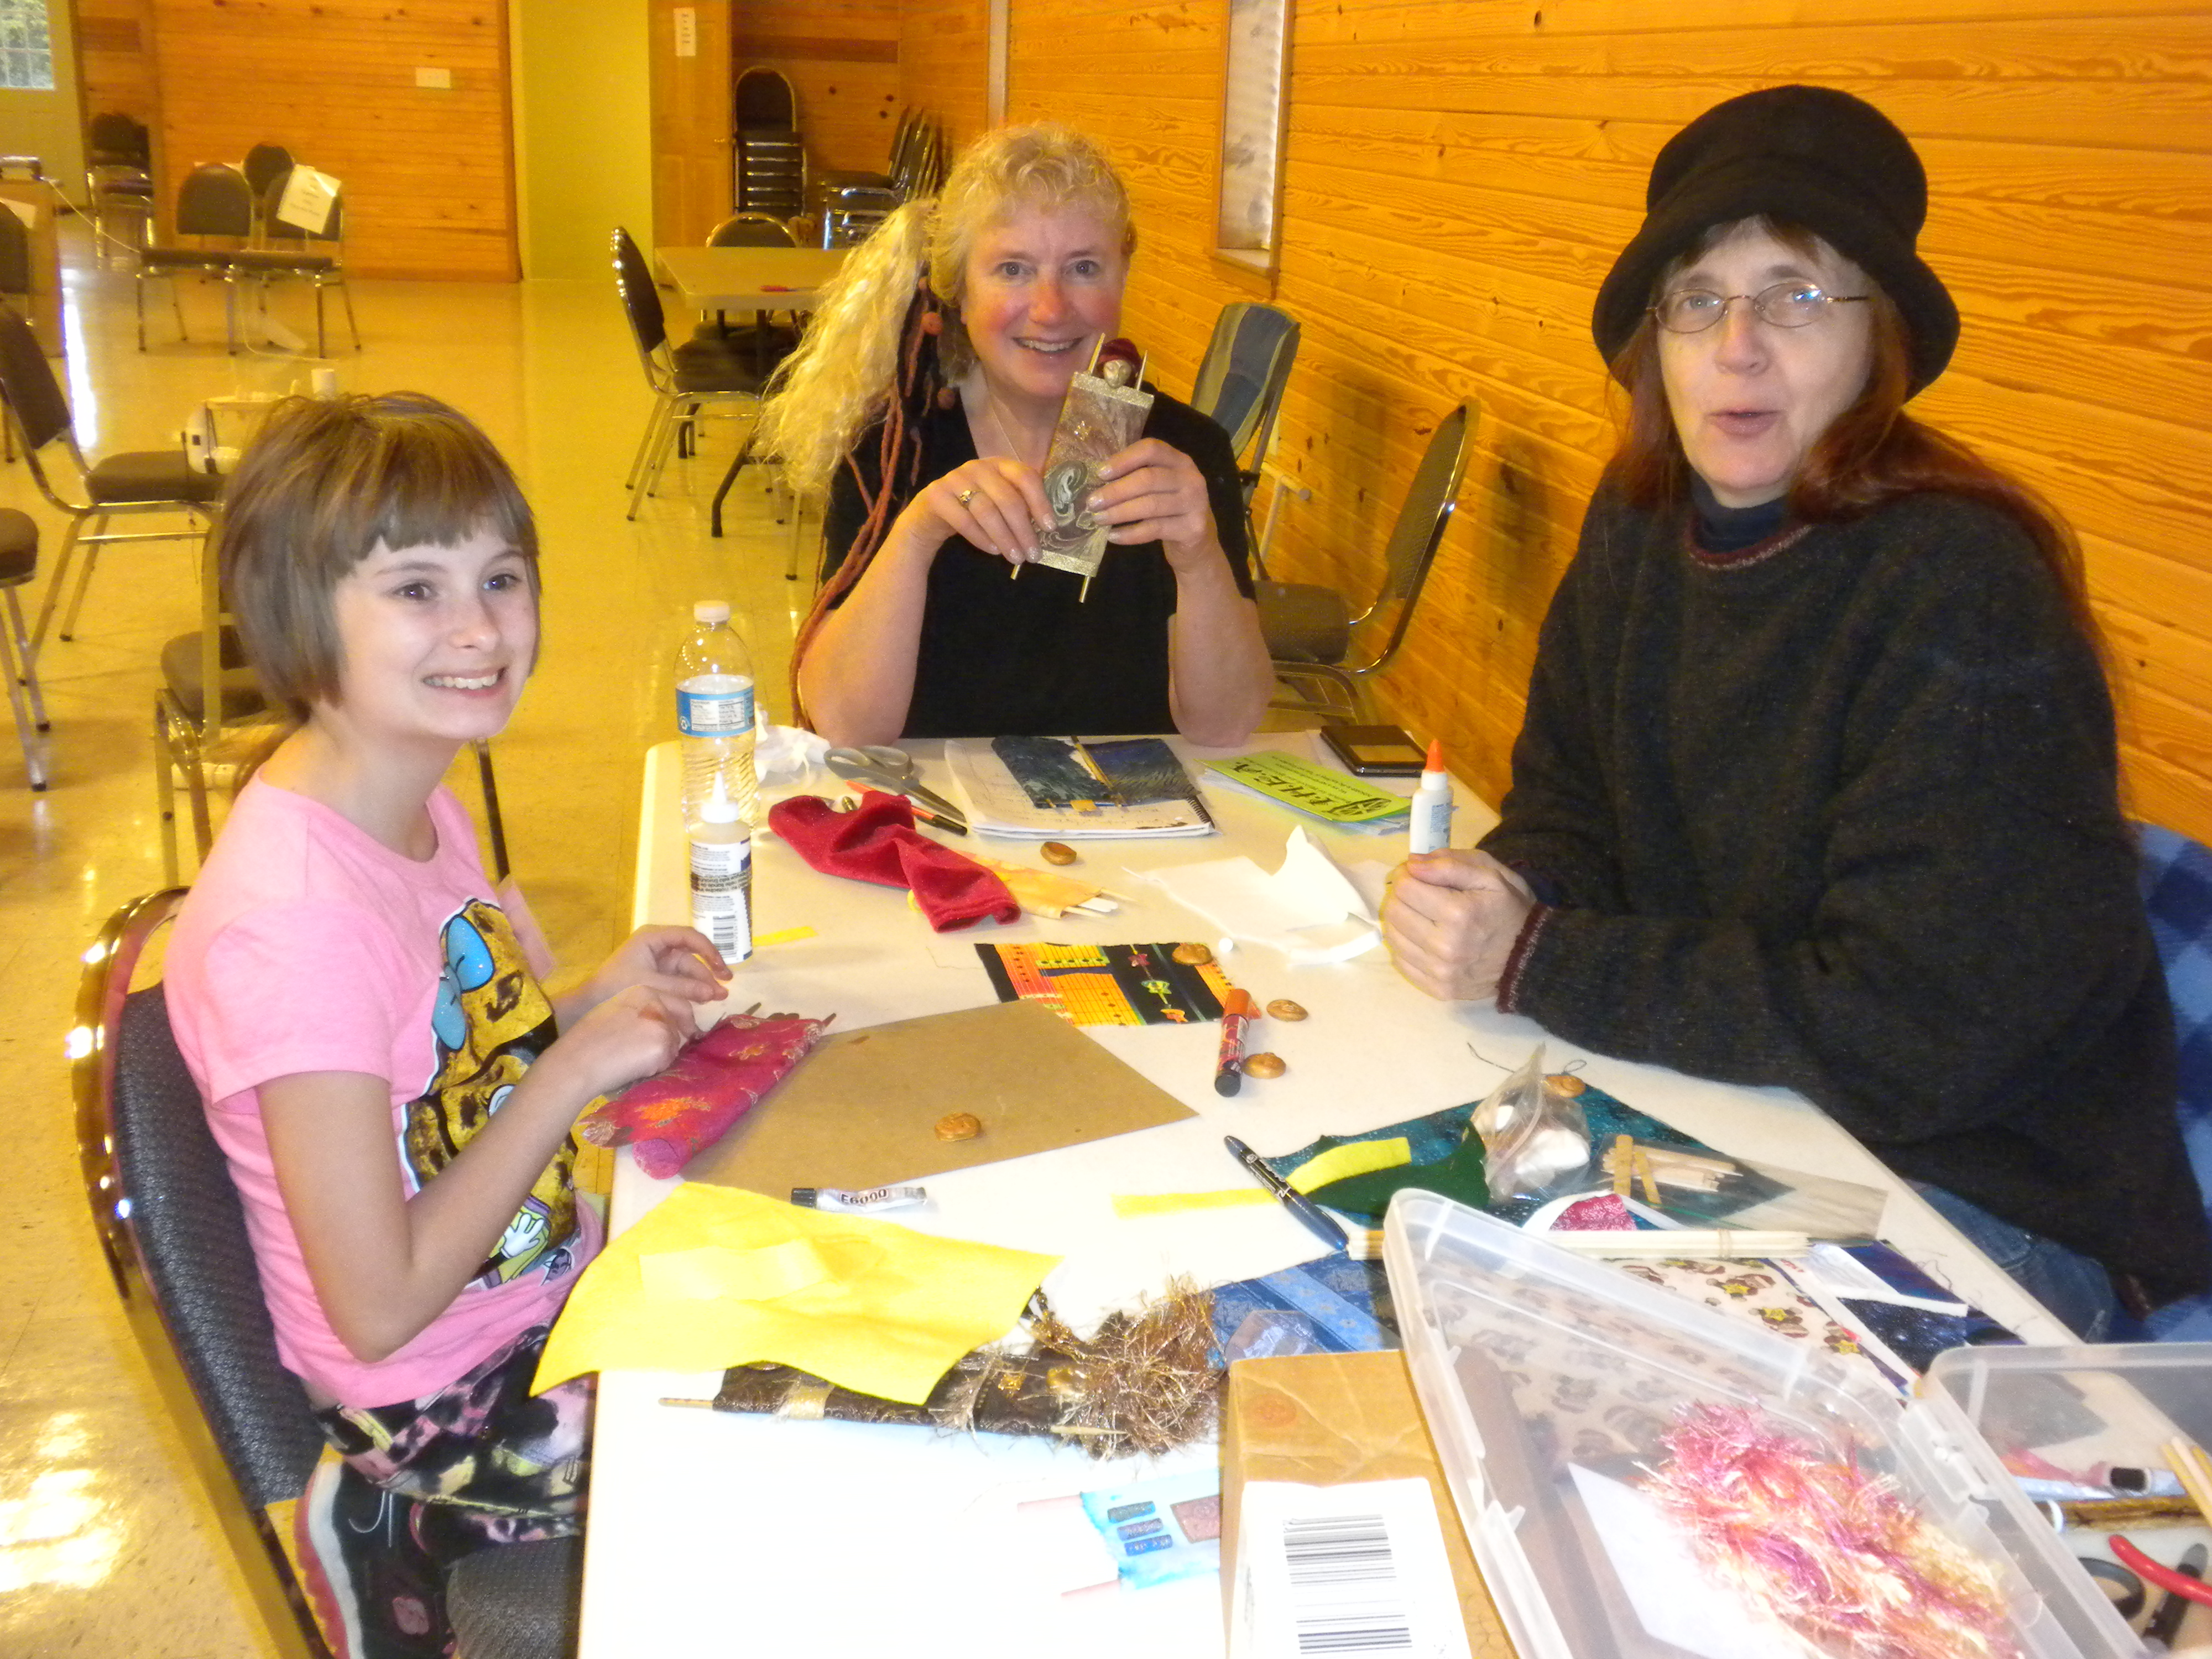 Fiber Art Dollmaking with Quhirrae Micheleu (teacher), Emma Durrill and Susan of Susan's Fiber Shop.